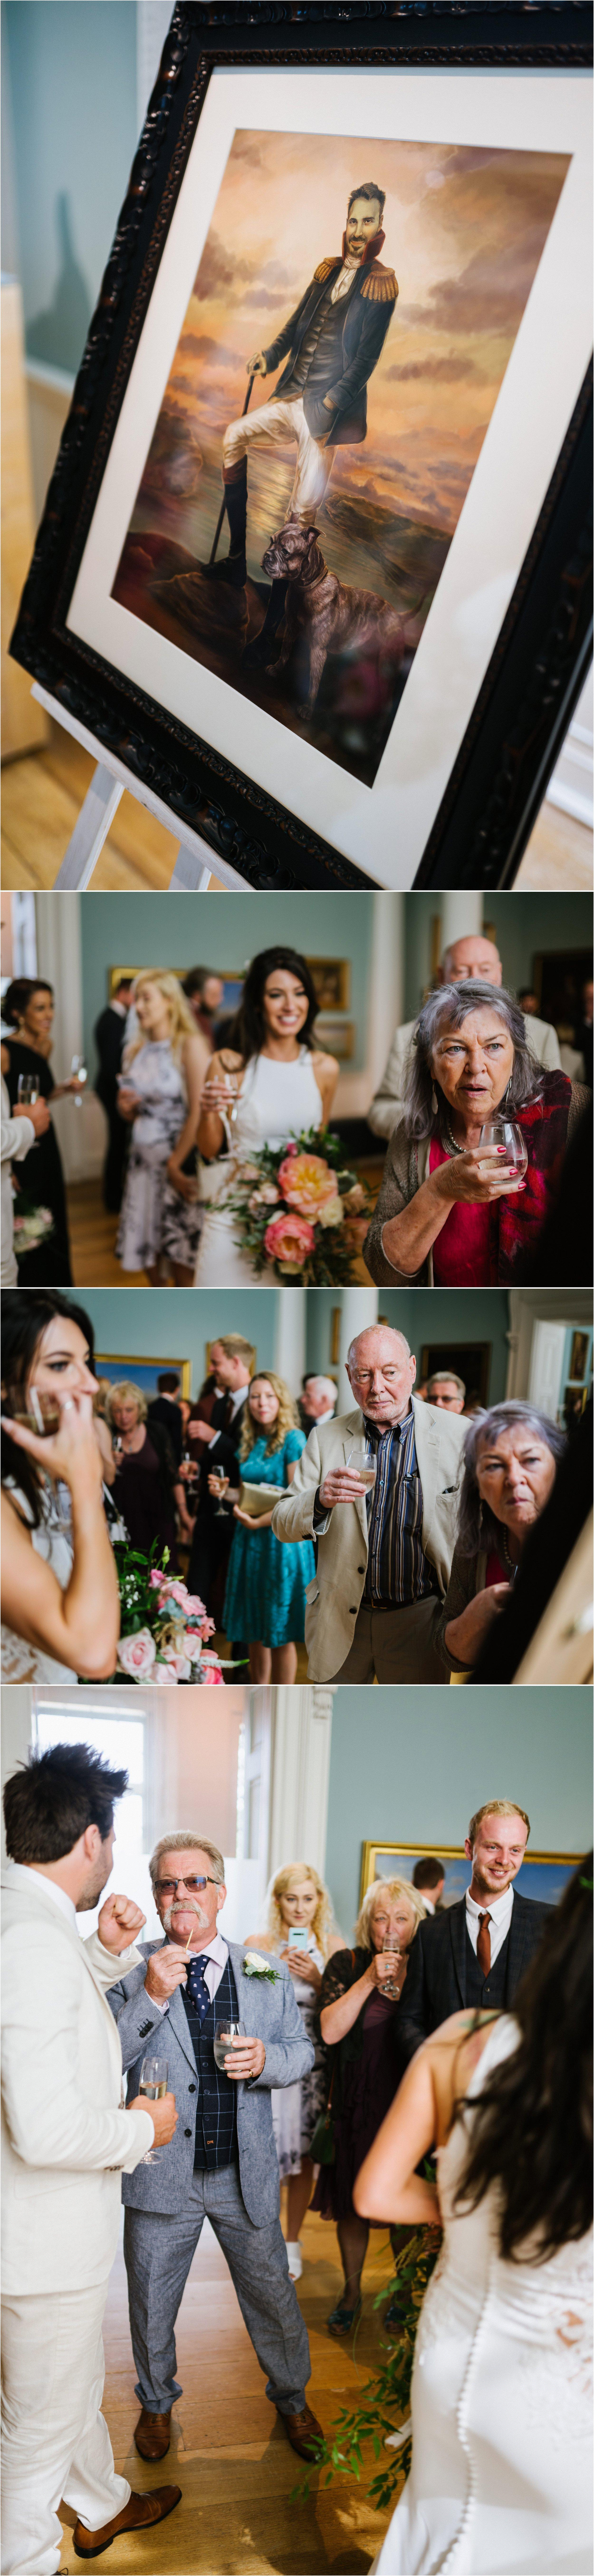 Compton Verney wedding photography_0090.jpg